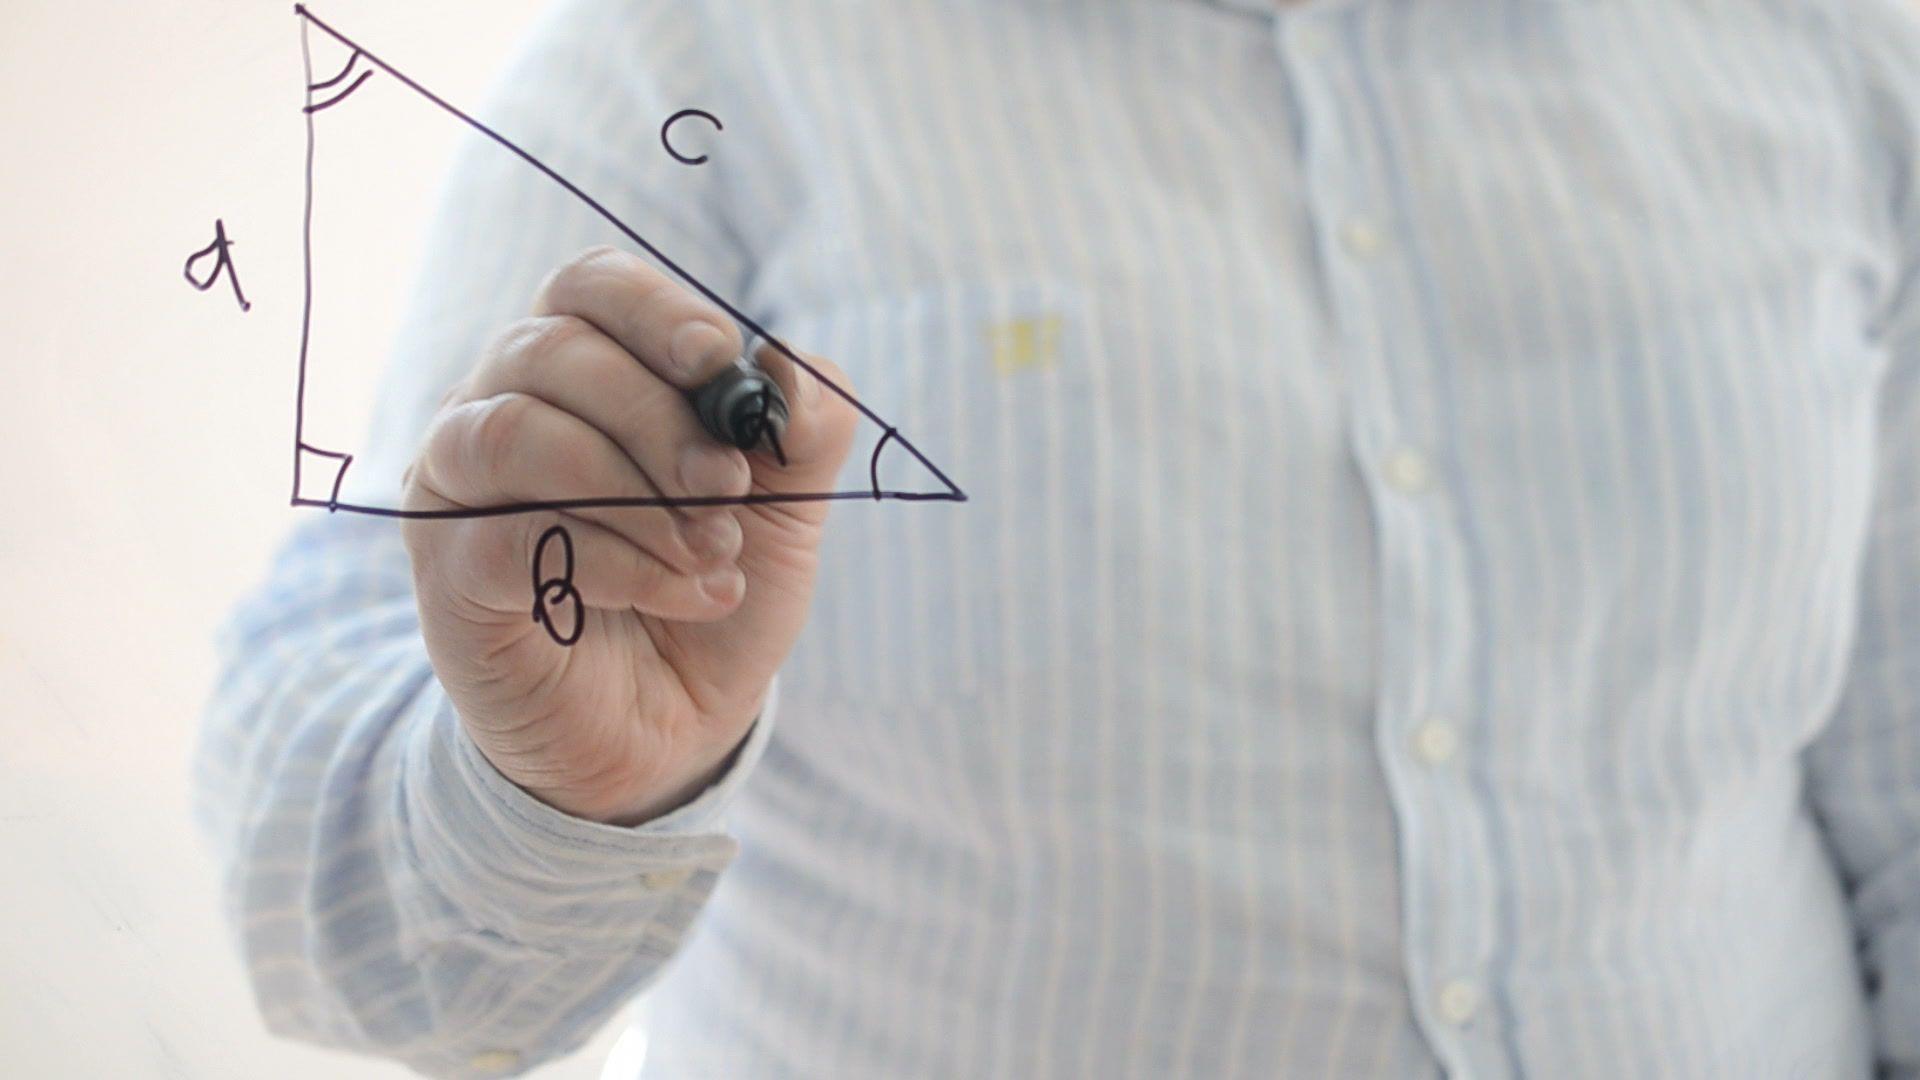 Pythagorean Theorem Properties Of A Rectangular Triangle